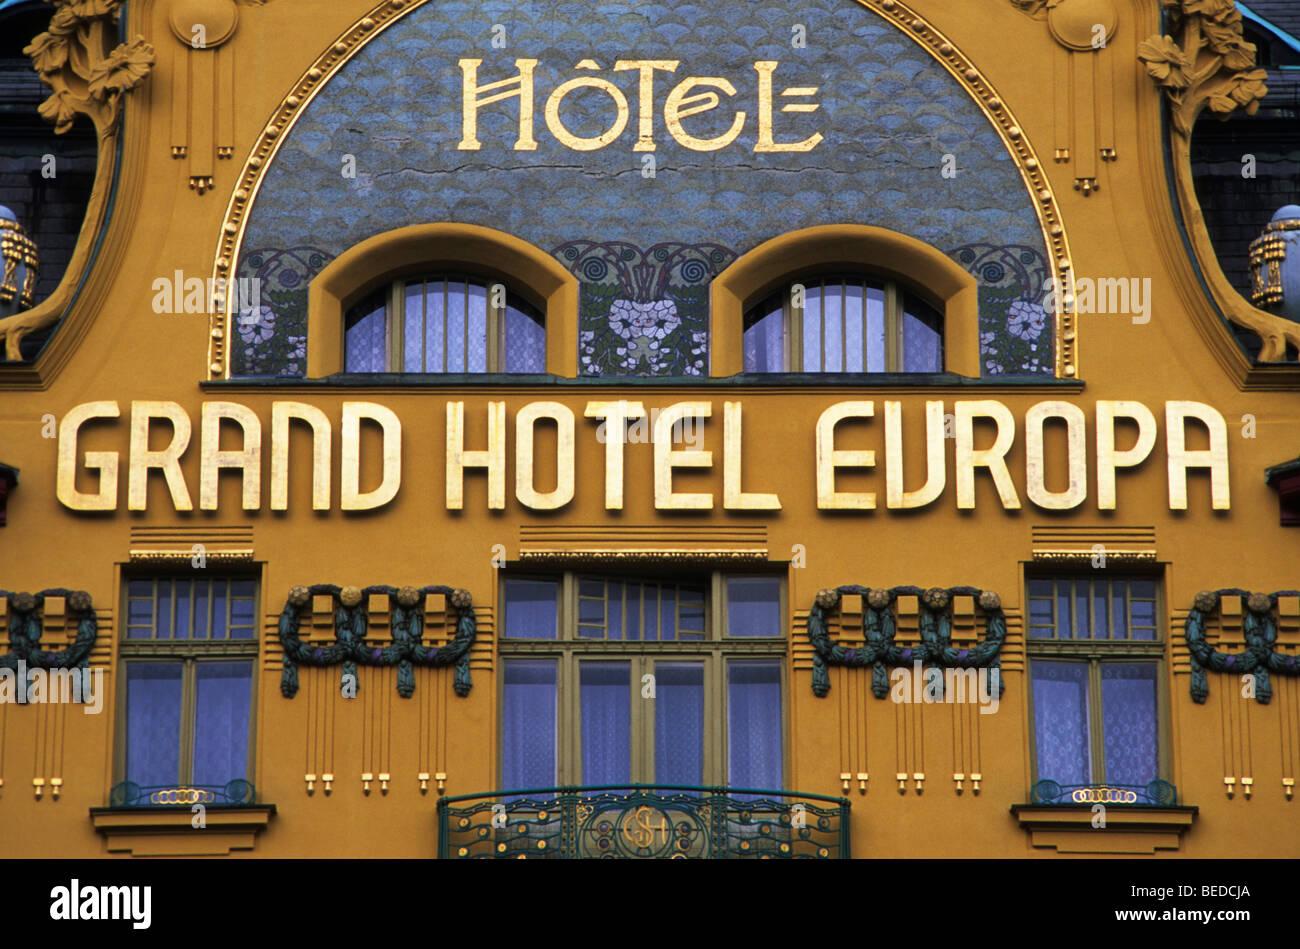 Art nouveau facade of the Grand Hotel Europa, Wenceslas Square, Prague, Czechia, Europe - Stock Image